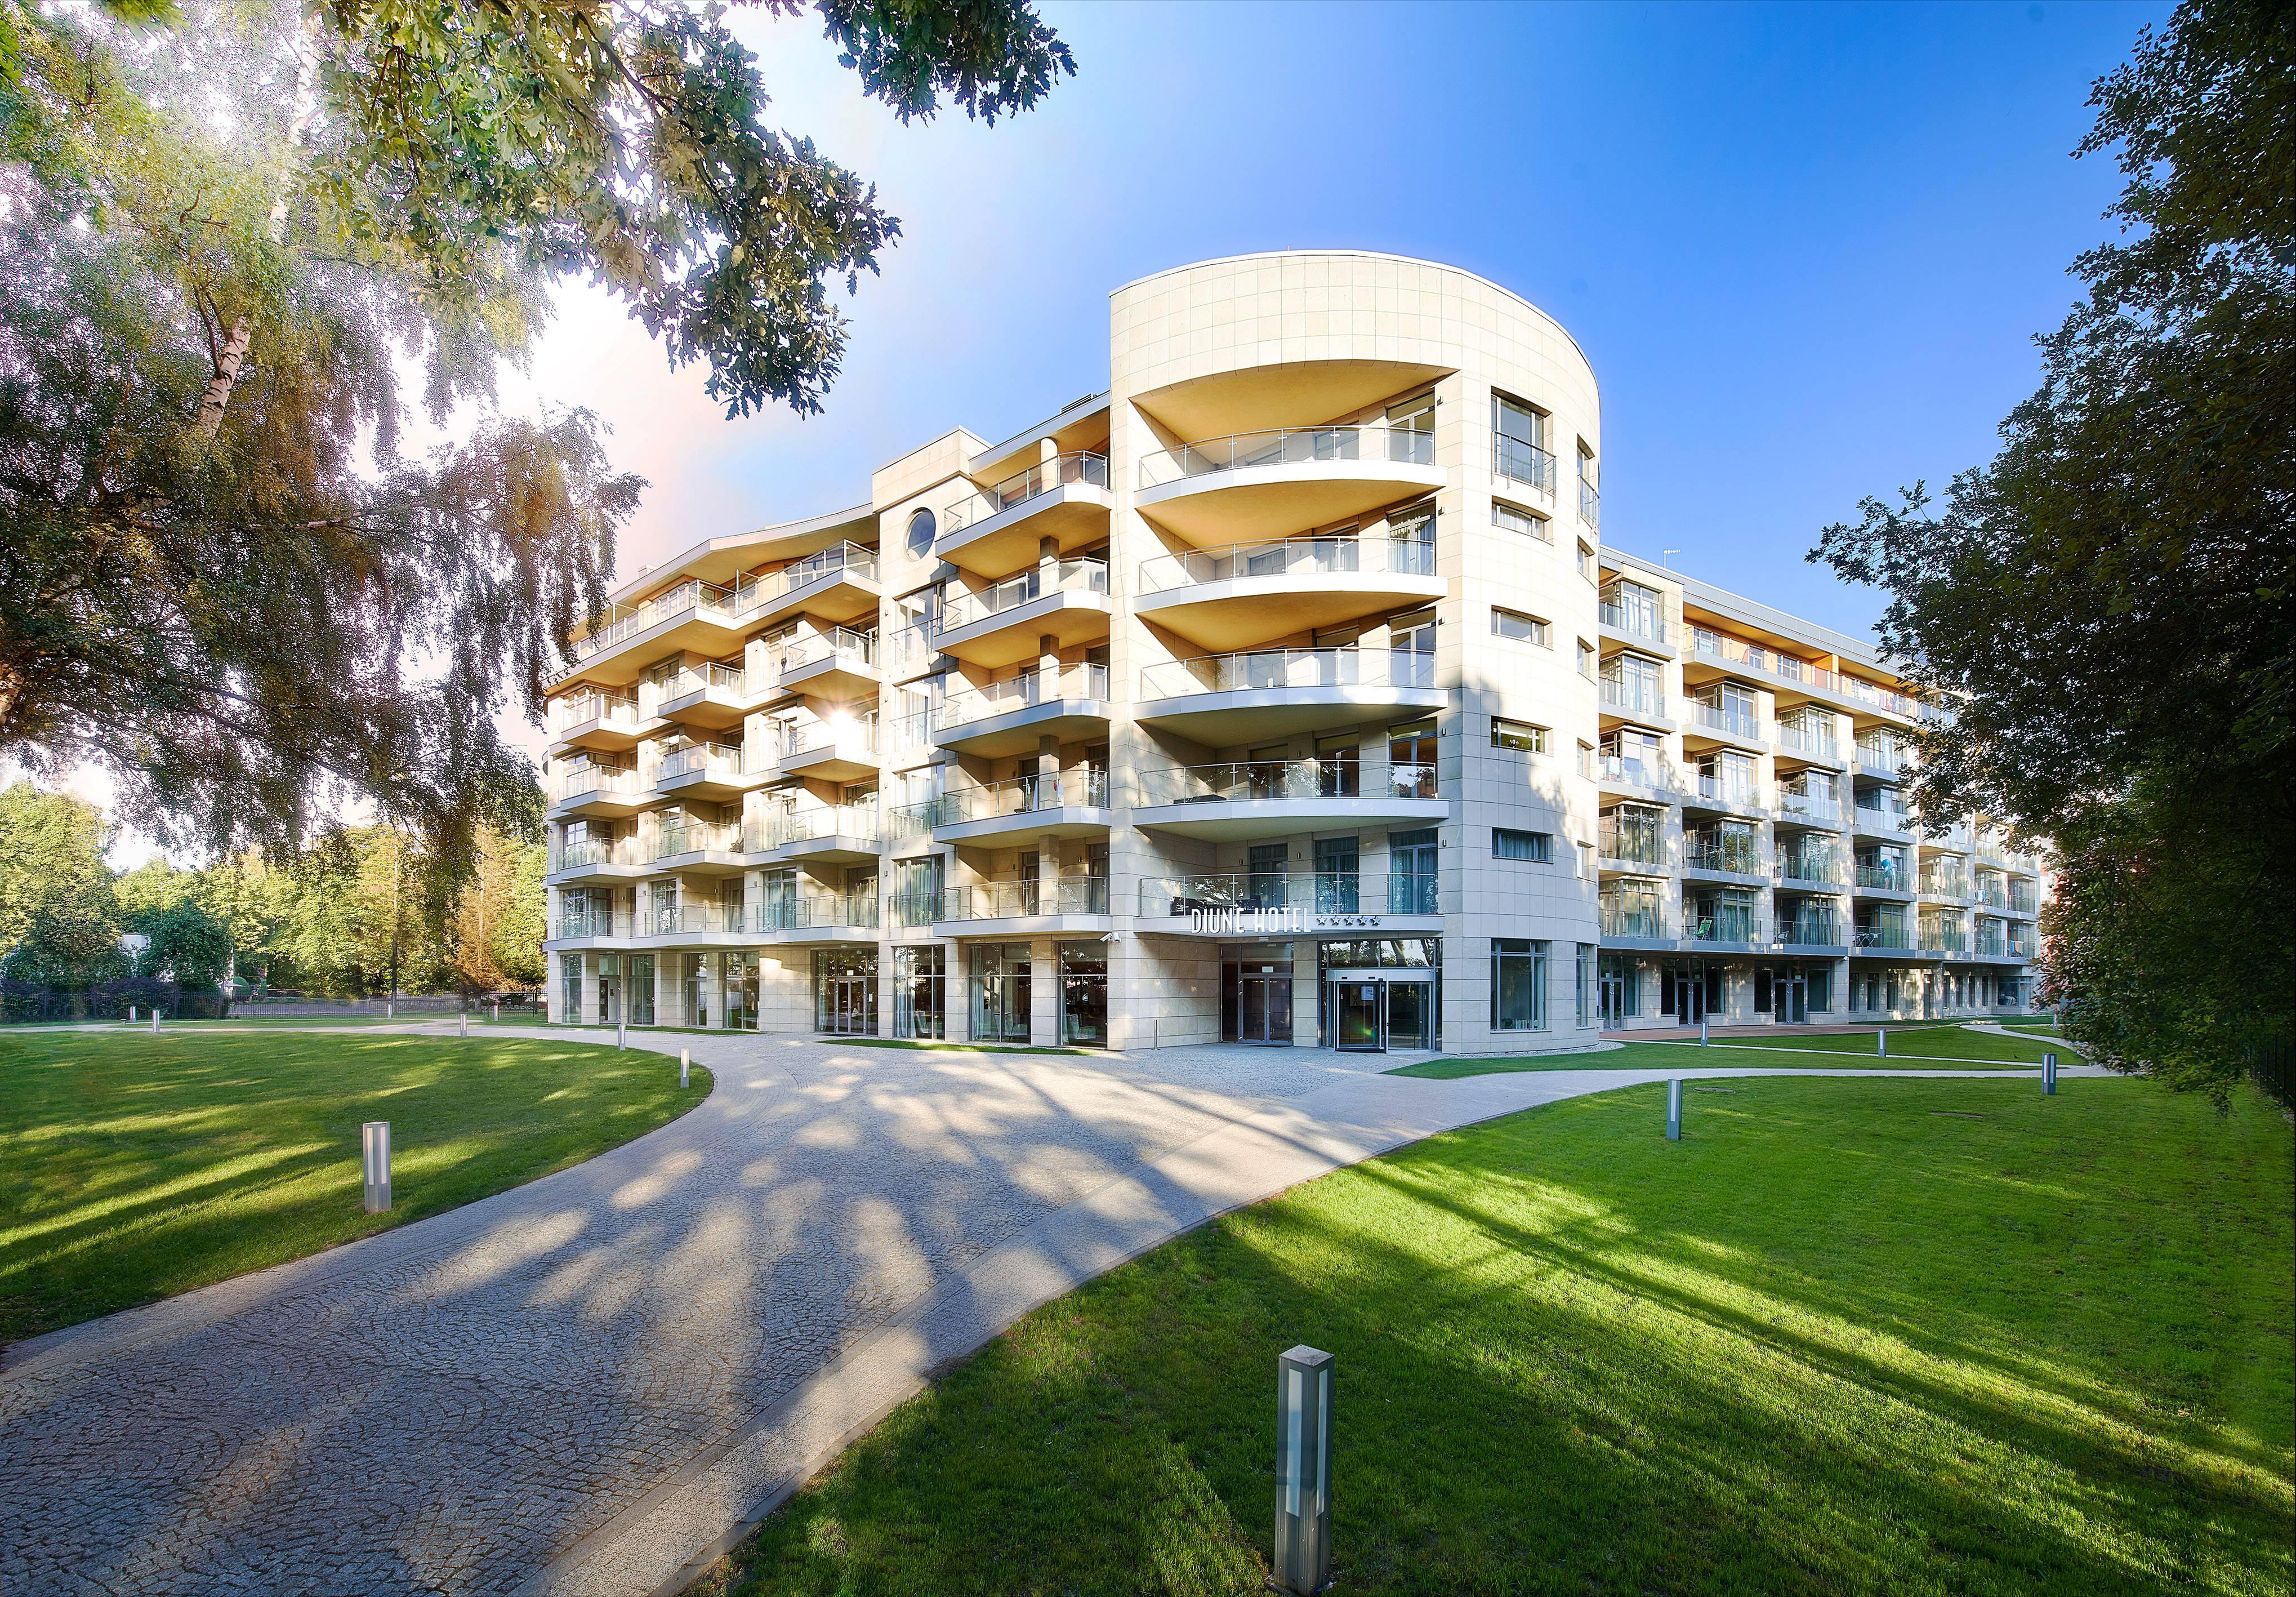 Hotel Solny Bewertung